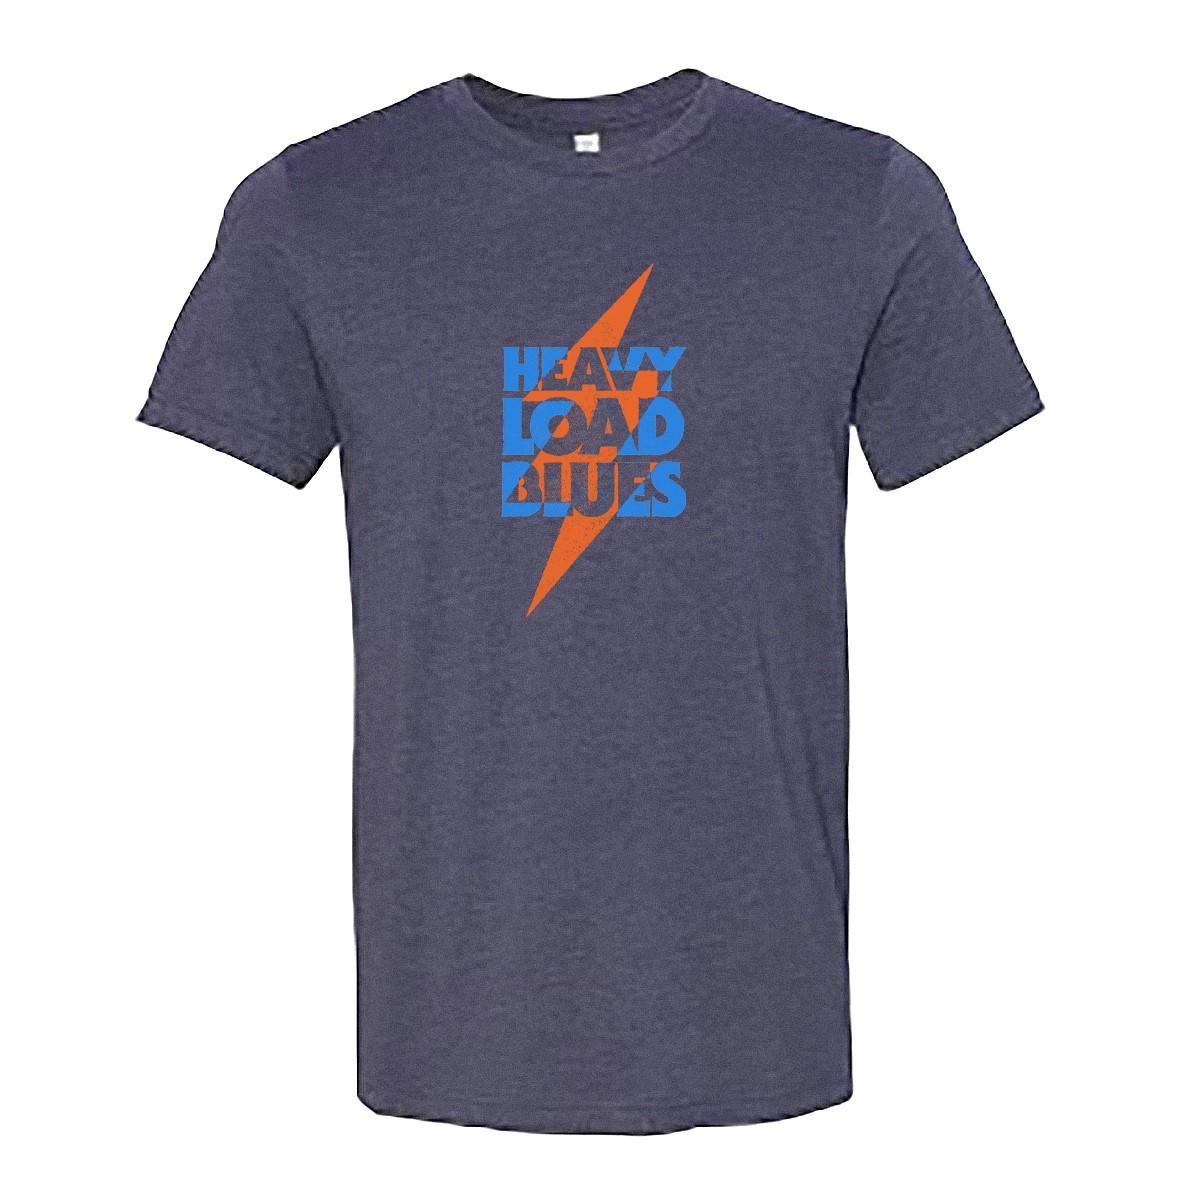 Heavy Load Blues T-shirt